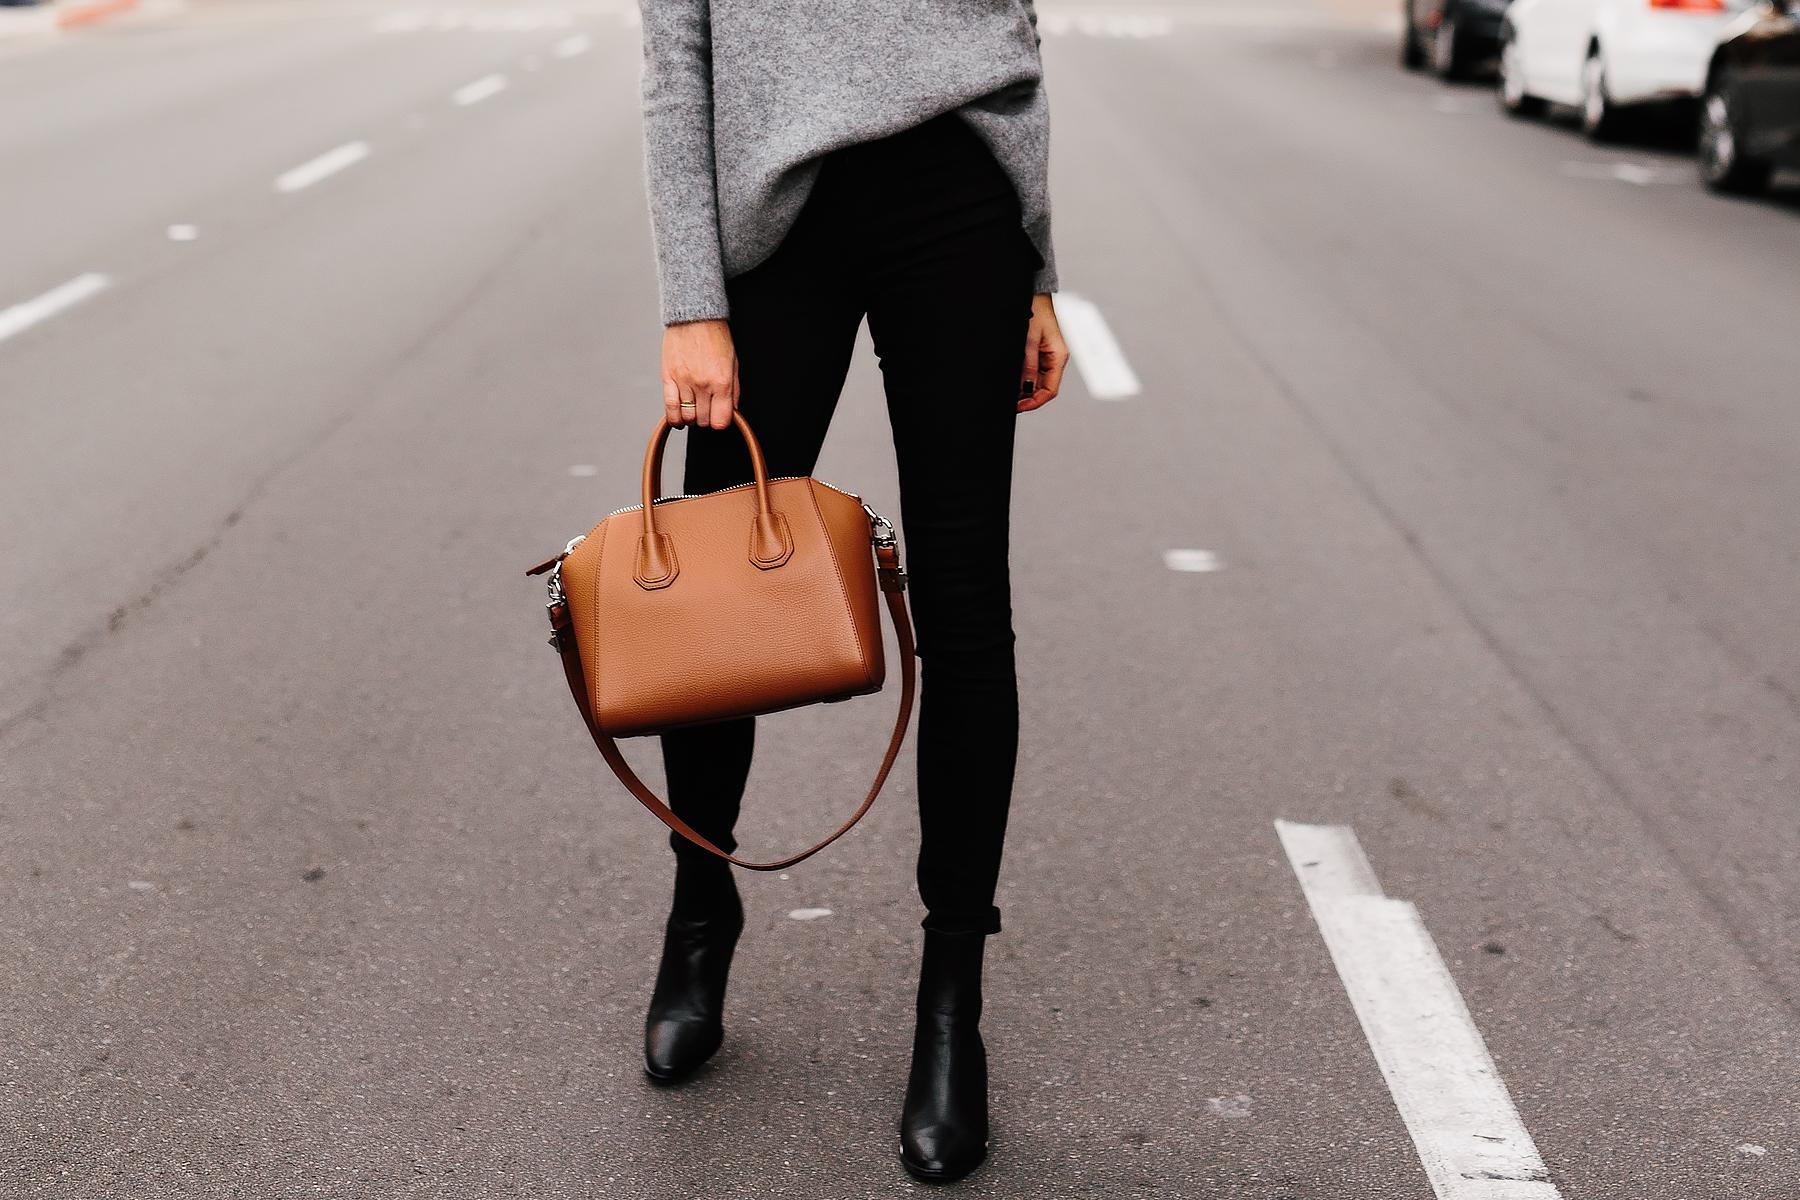 Fashion Jackson Black Skinnt Jeans Grey Sweater Black Booties Tan Satchel Handbag